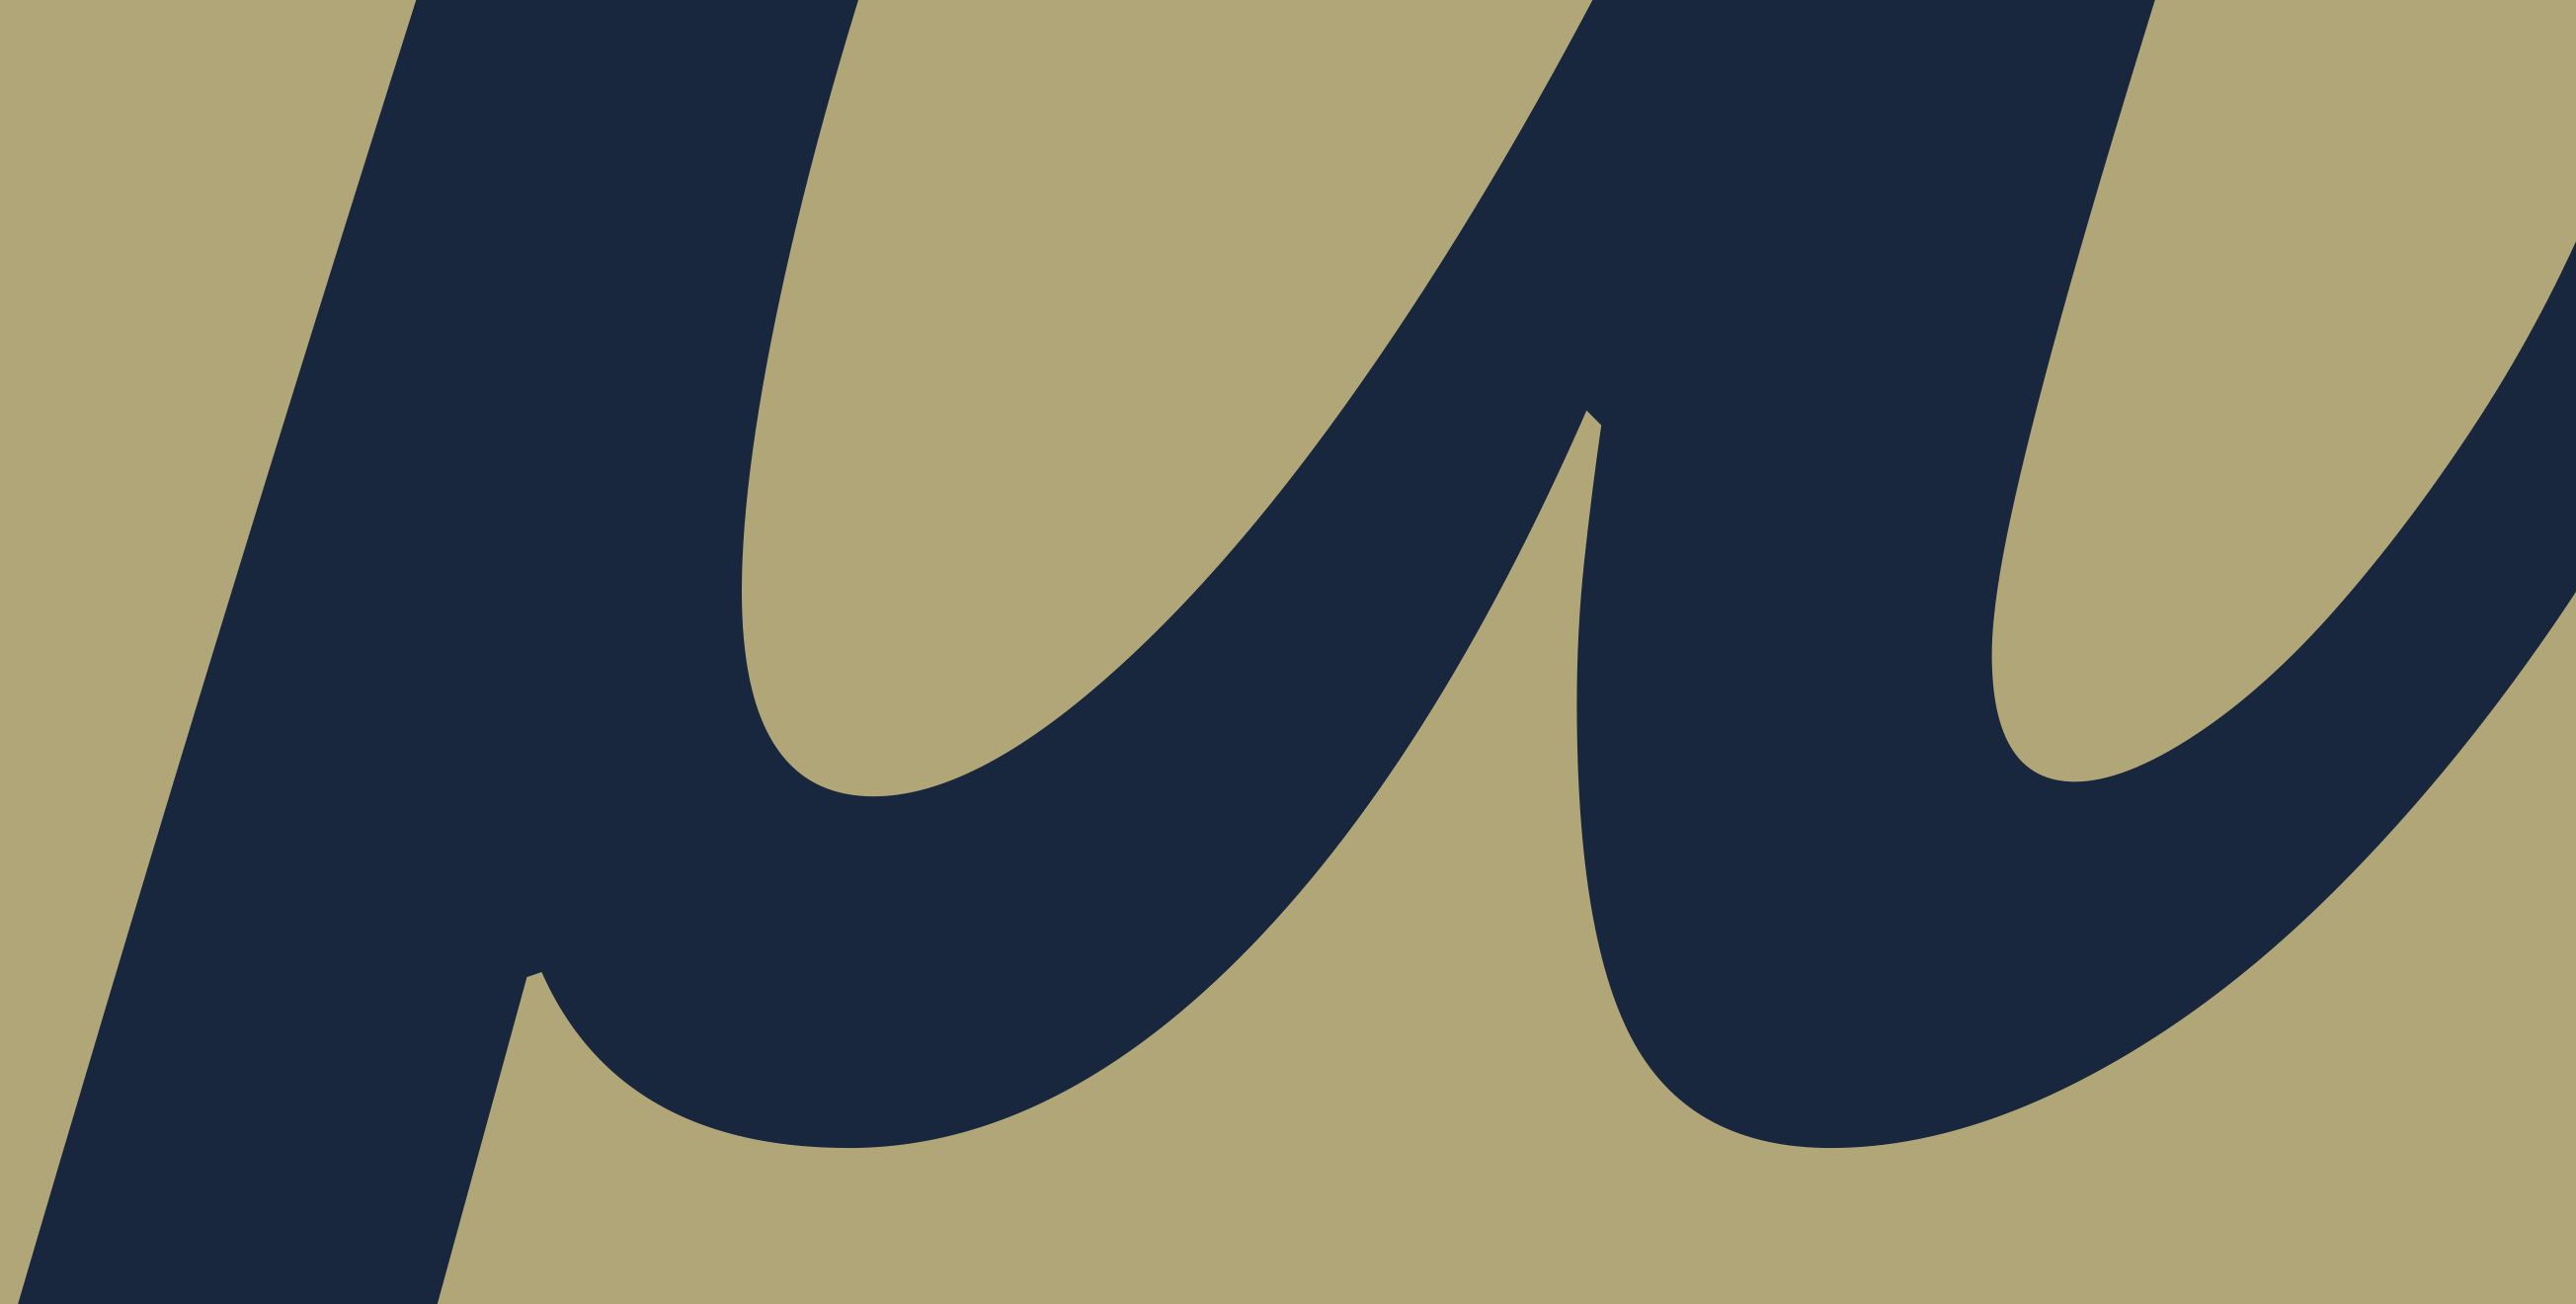 work__myresearch-06